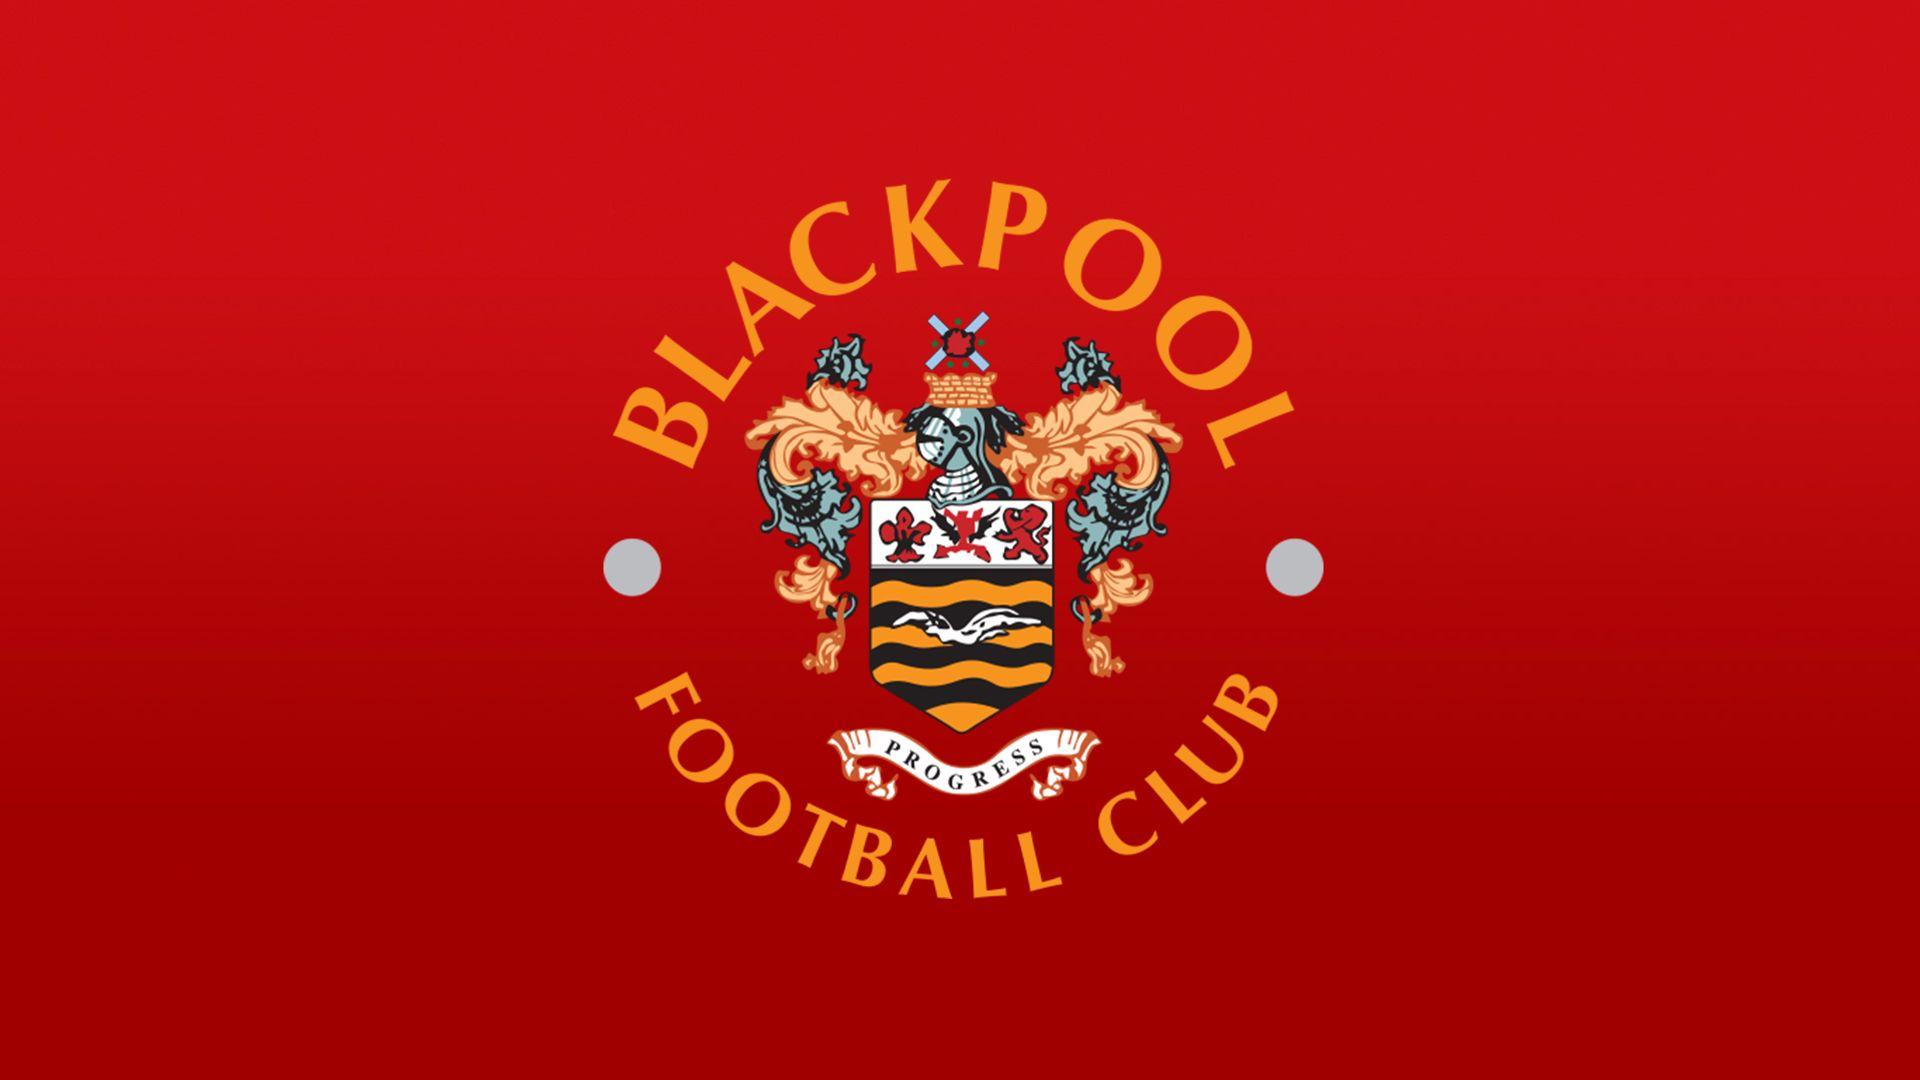 Blackpool fixtures: Championship 2021/22